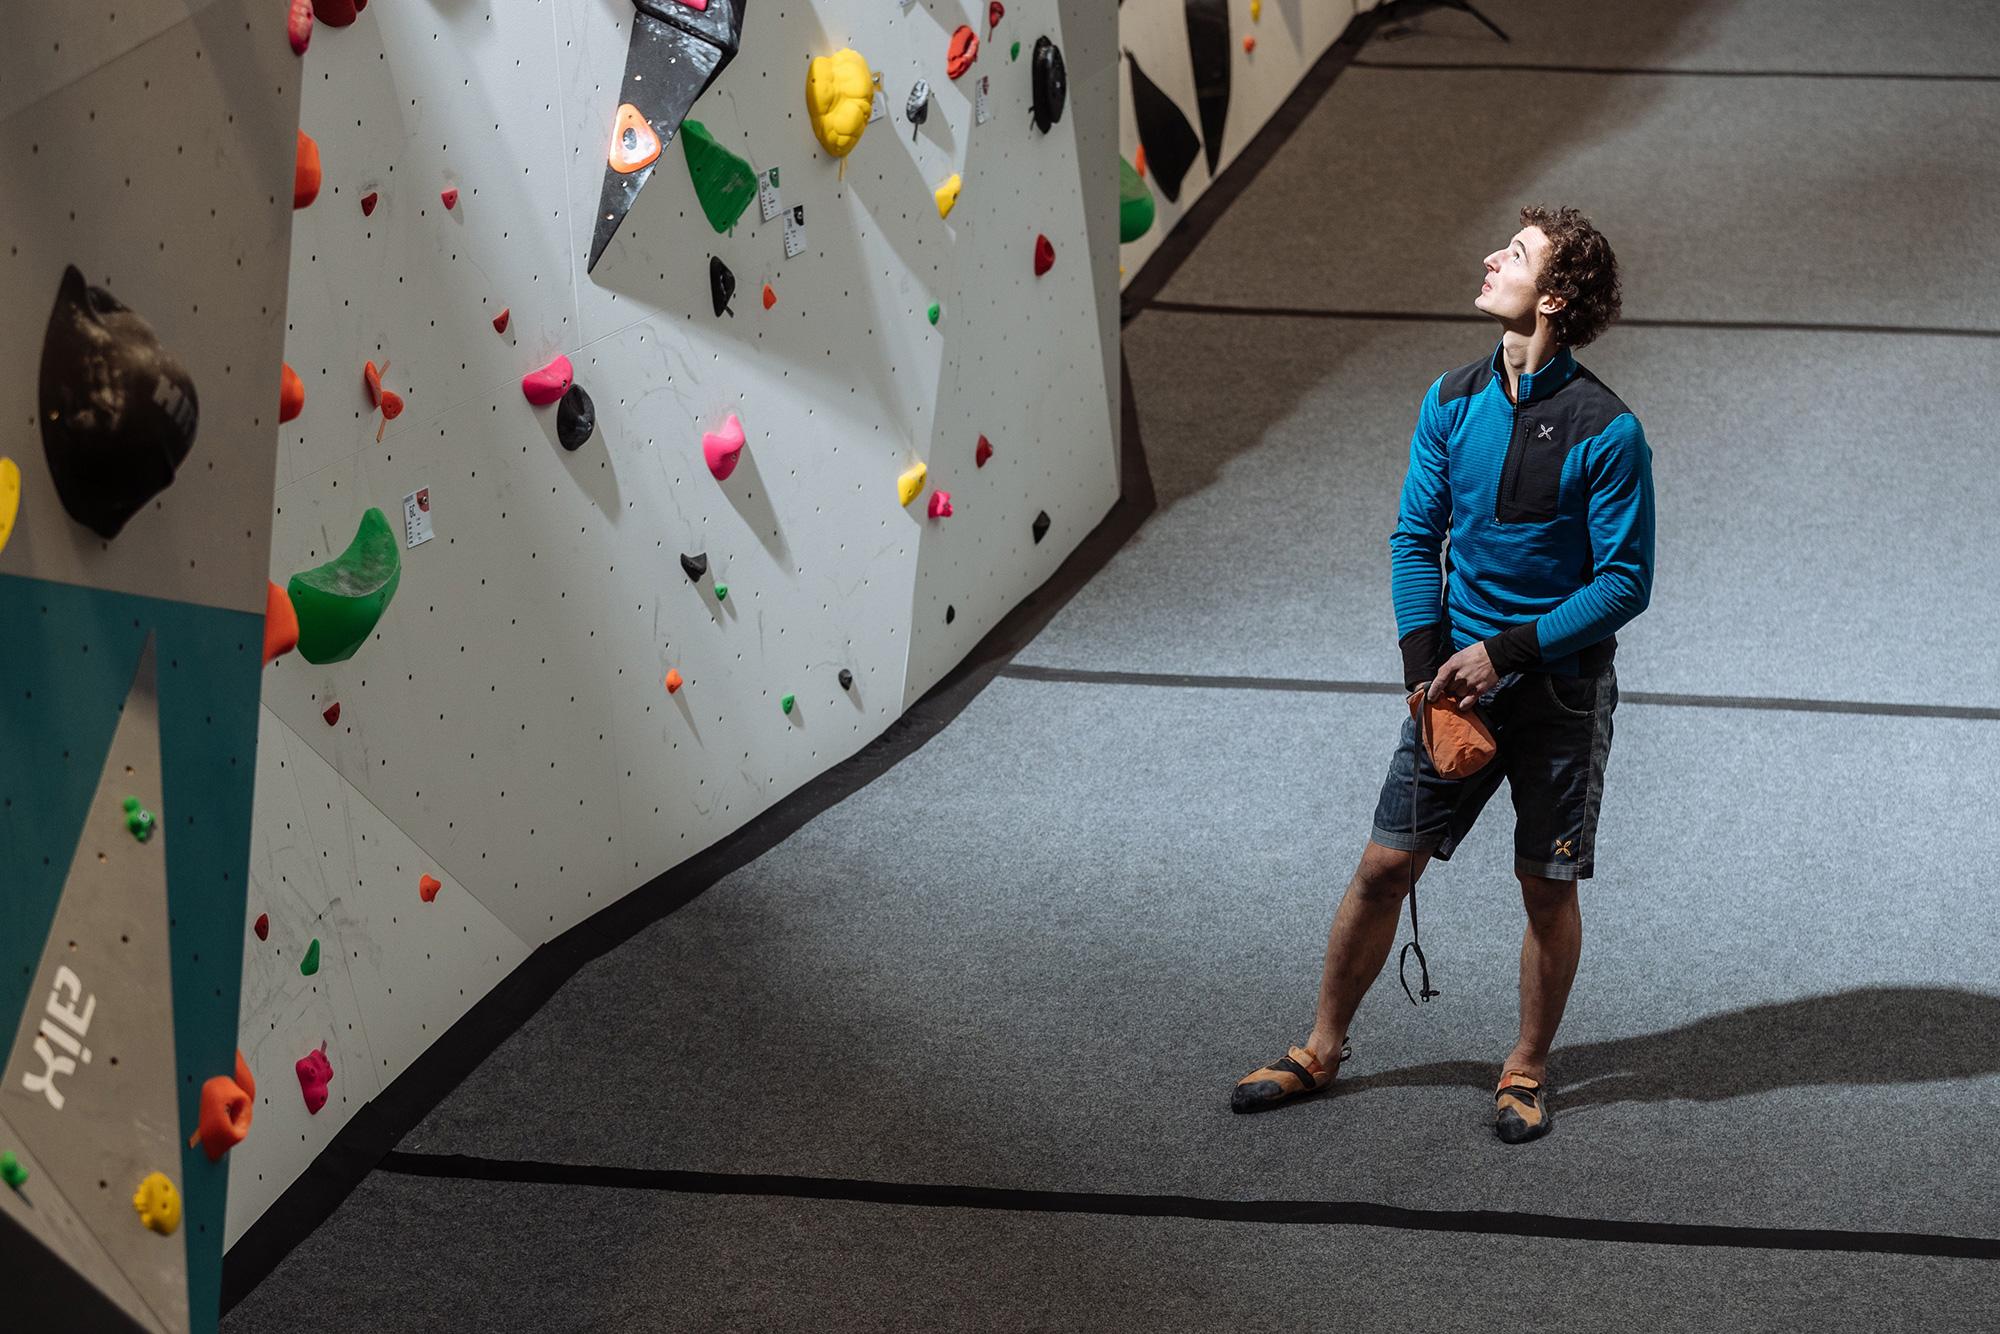 Adam Ondra in Hangar climbing gym in Brno.